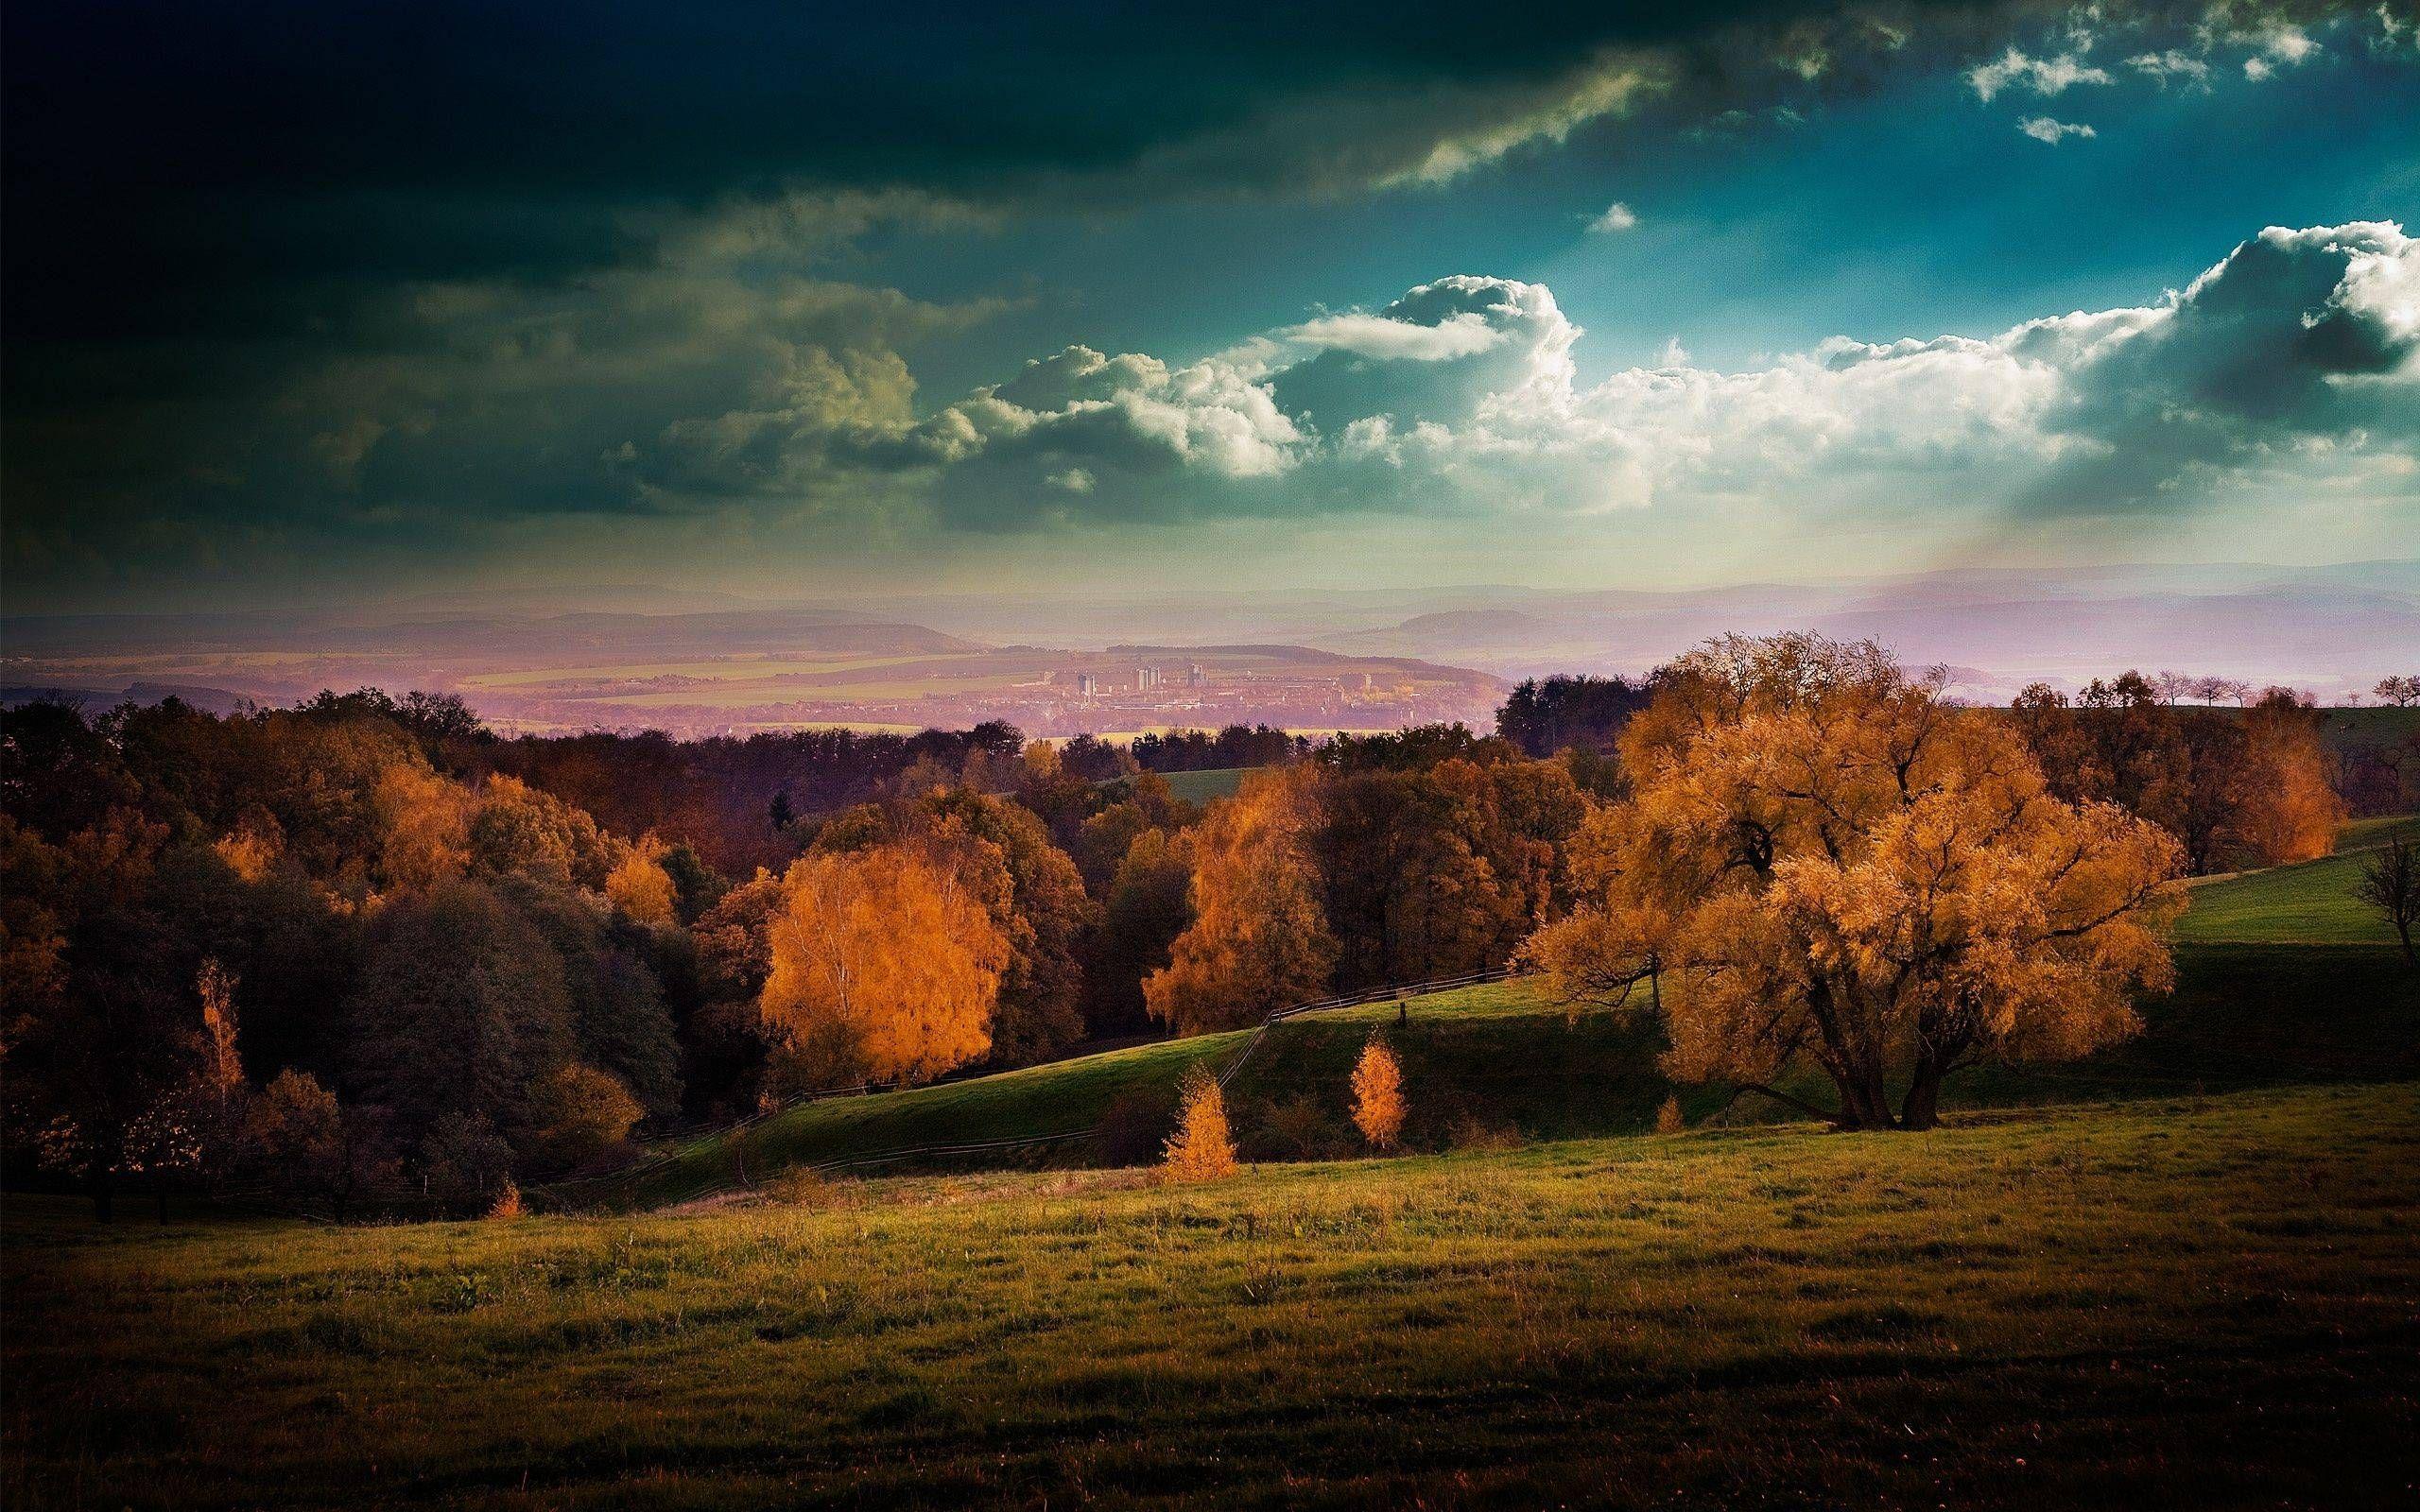 Autumn Landscape Wallpaper And Photo High Resolution Download Autumn Landscape Scenery Wallpaper Landscape